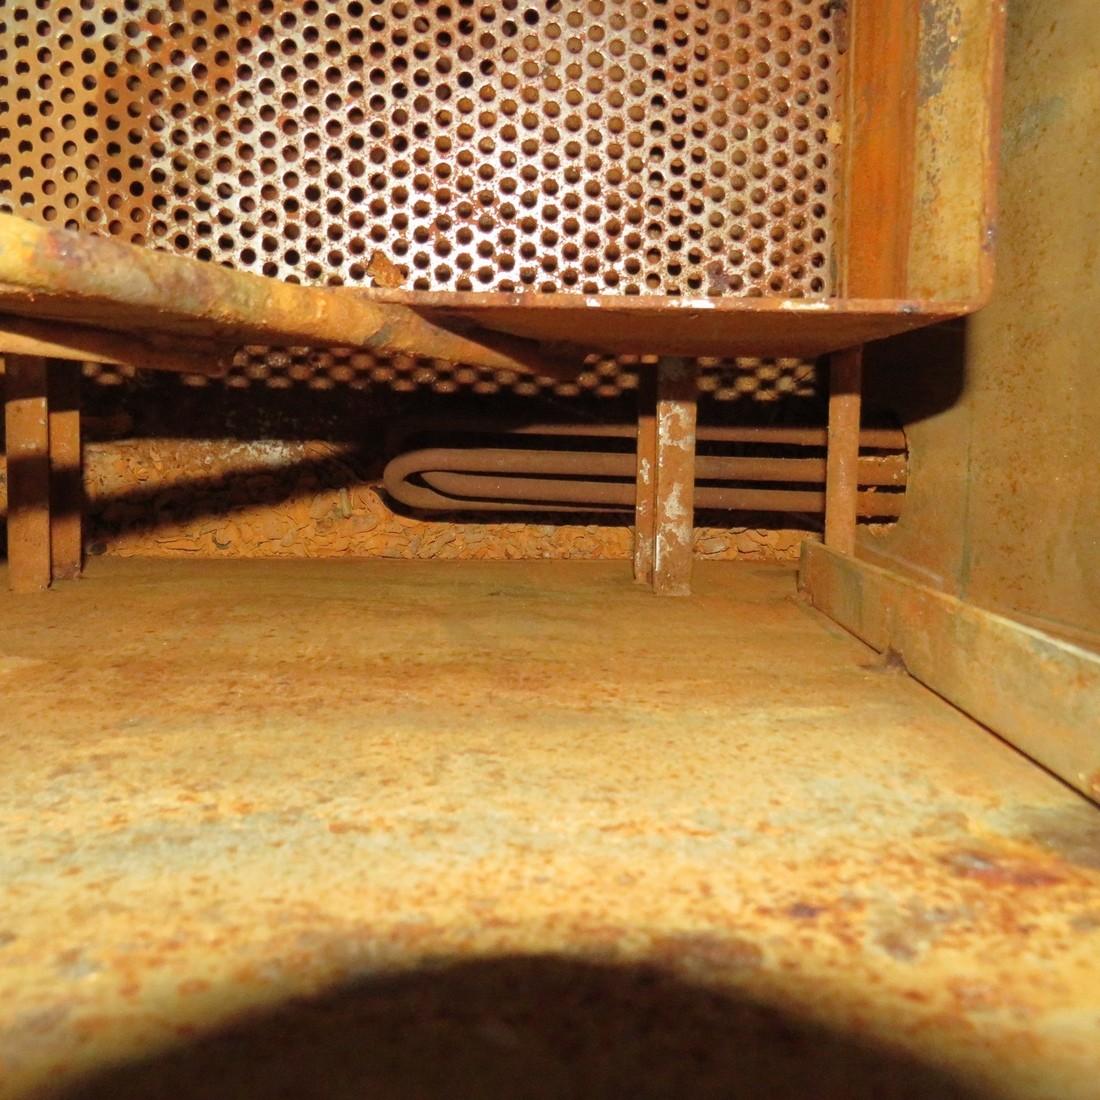 R1N730 ELTI Oven - CFHS 2 - 650°C